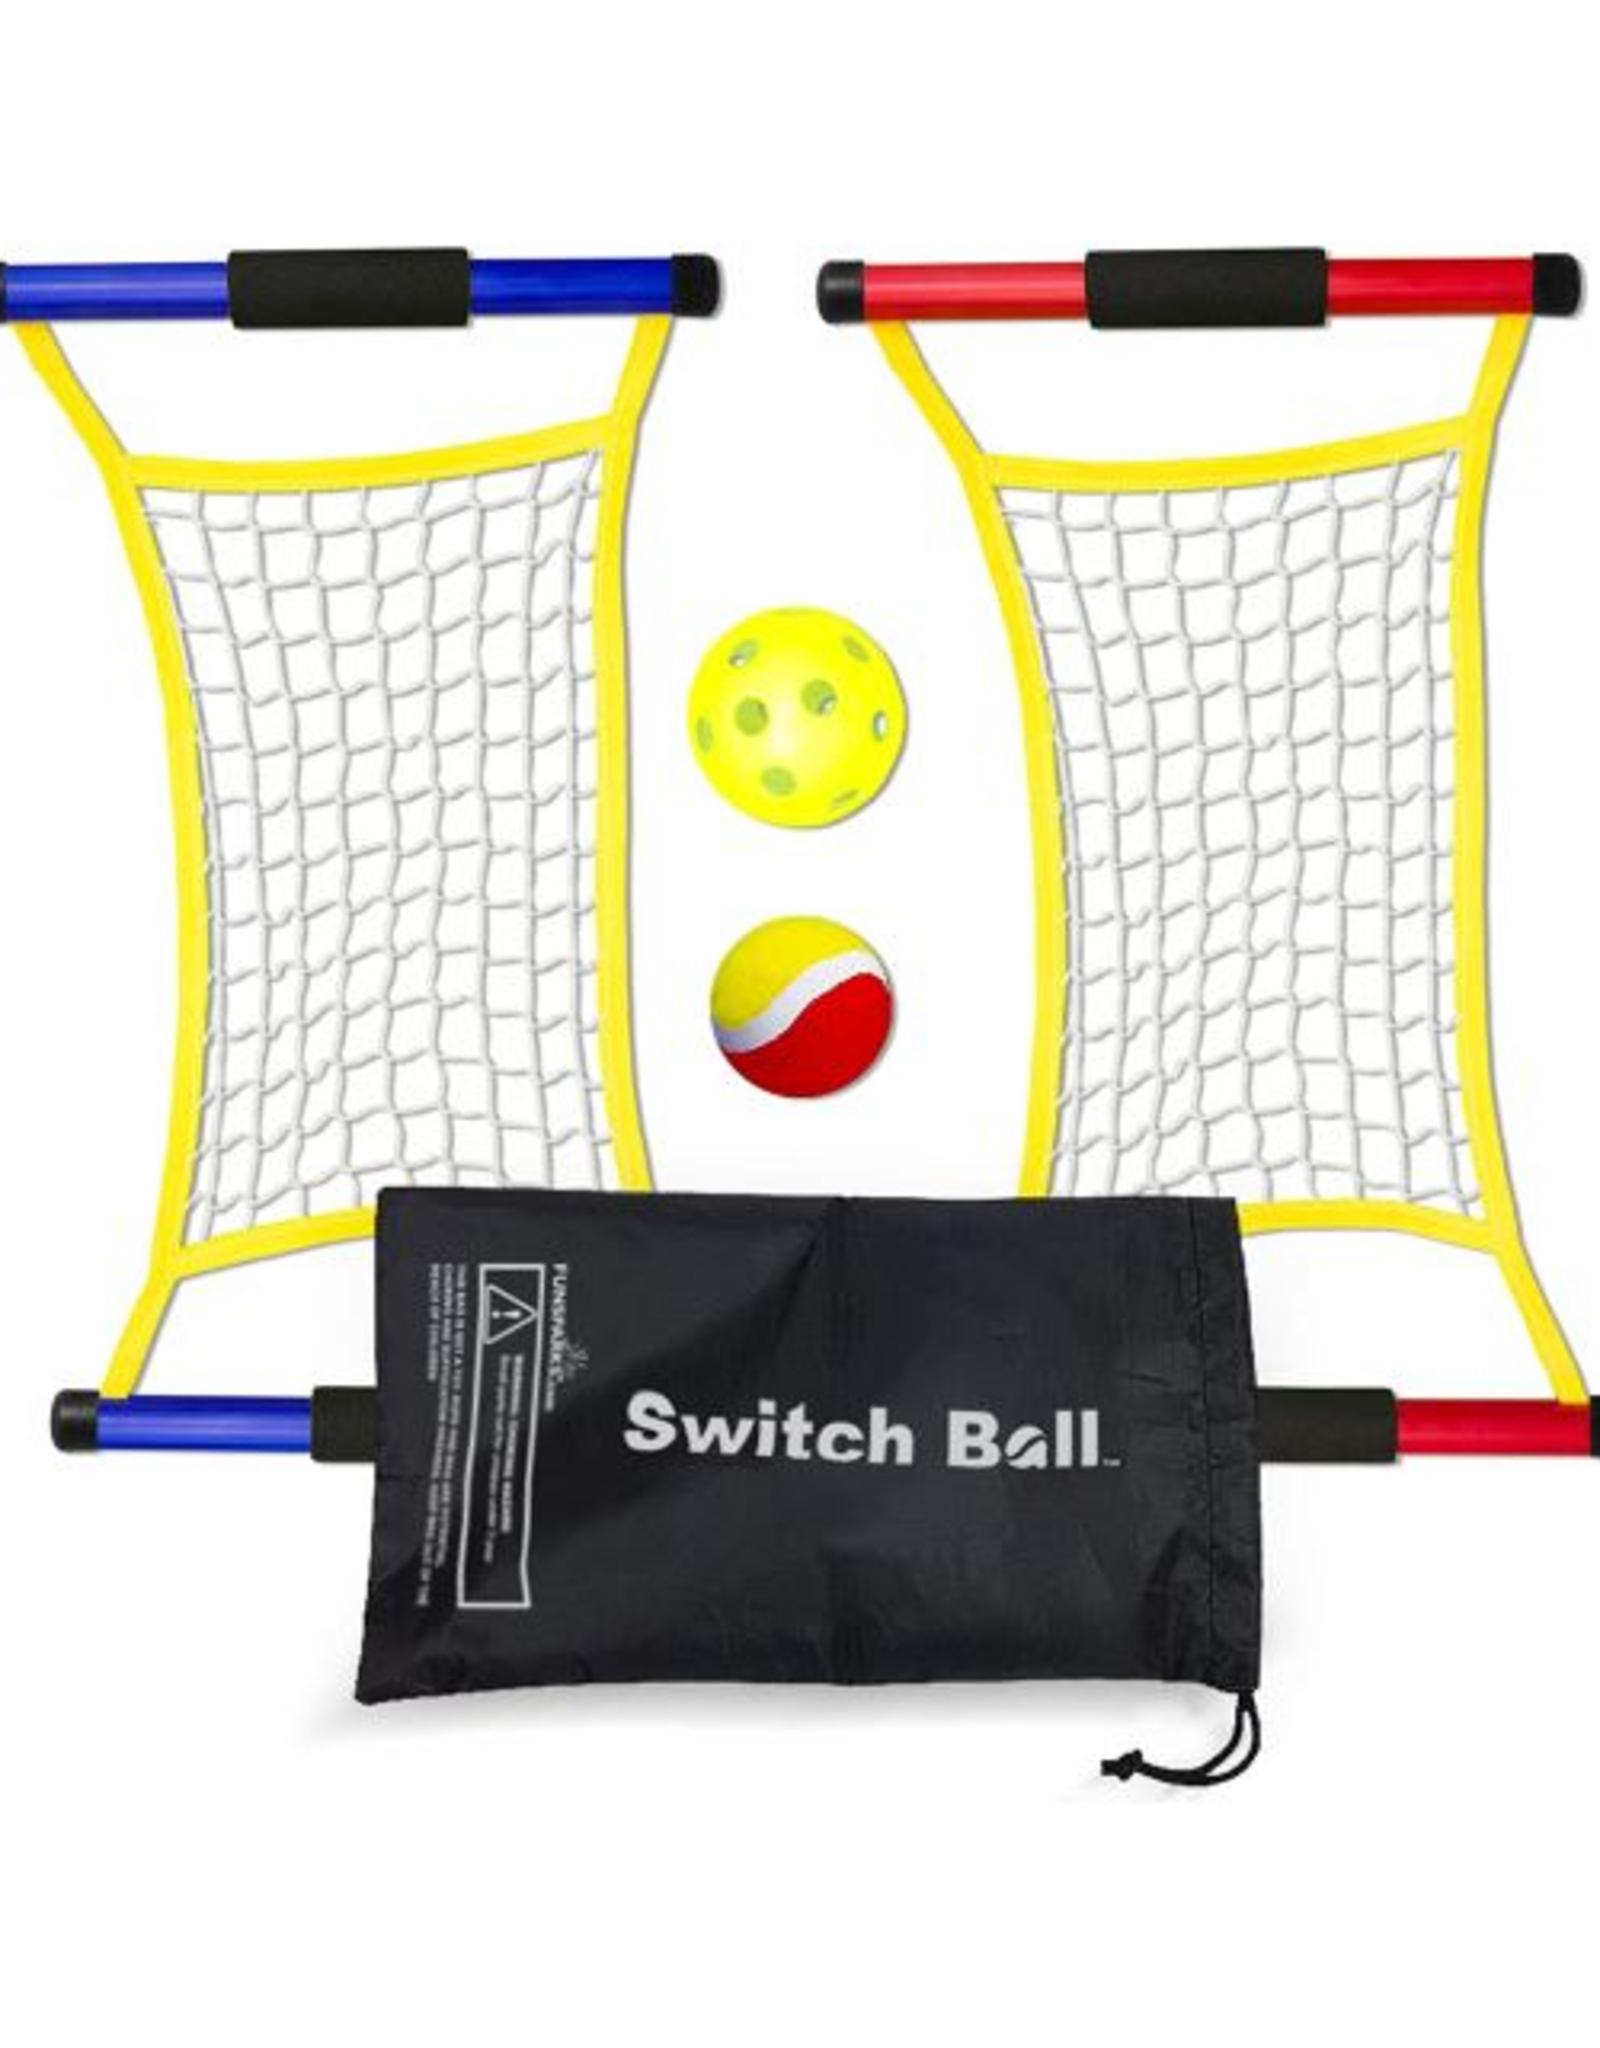 Switch Ball